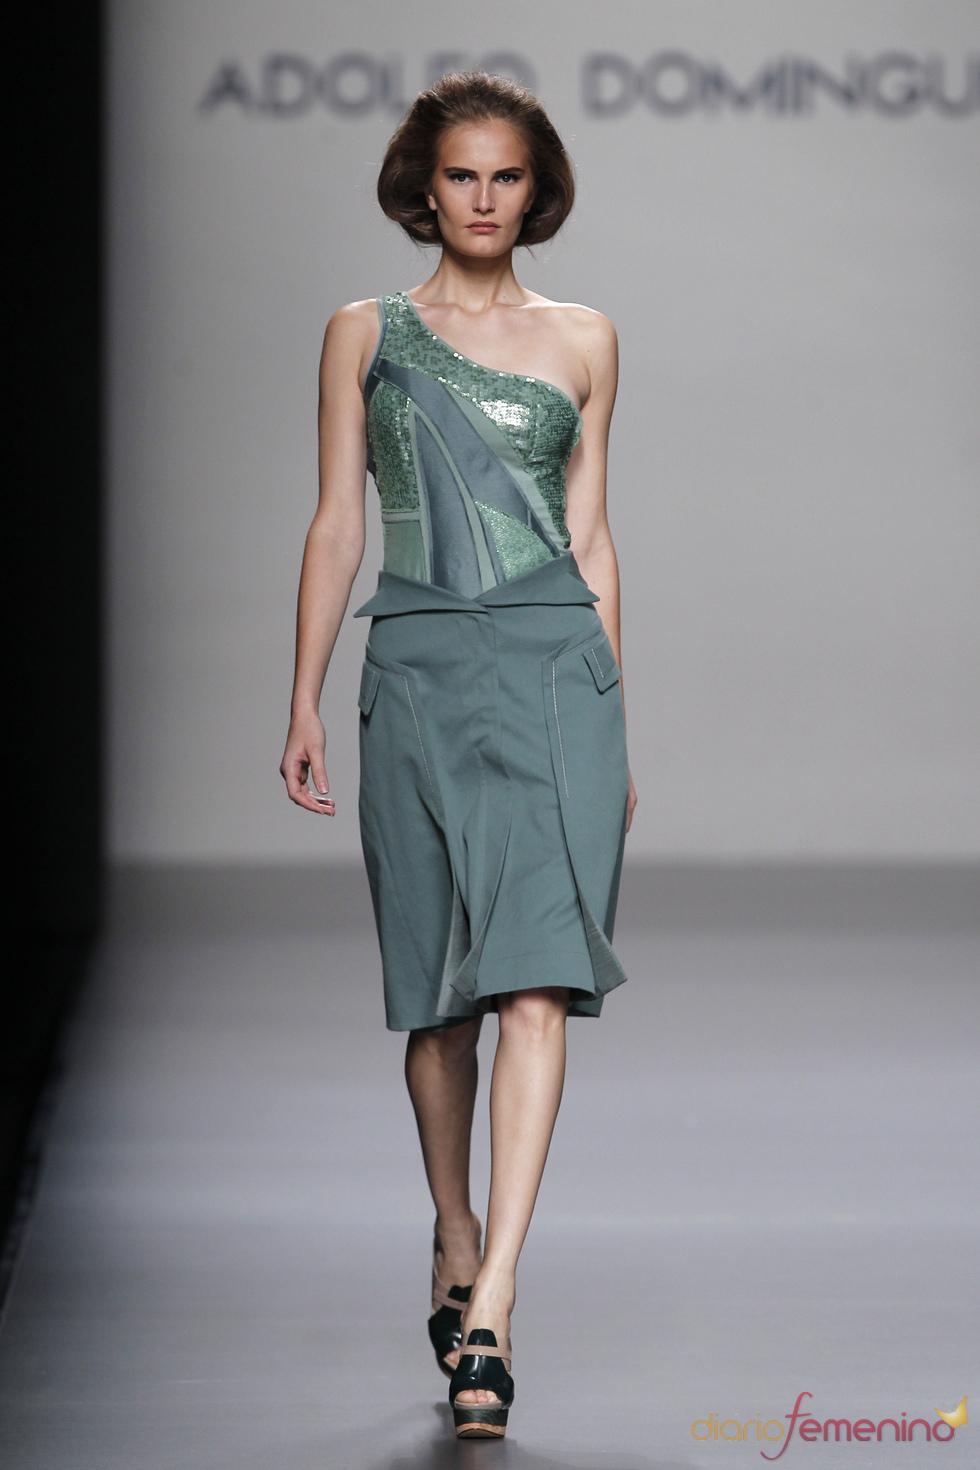 La elegancia femenina seg n adolfo dom nguez for Adolfo dominguez oficinas madrid